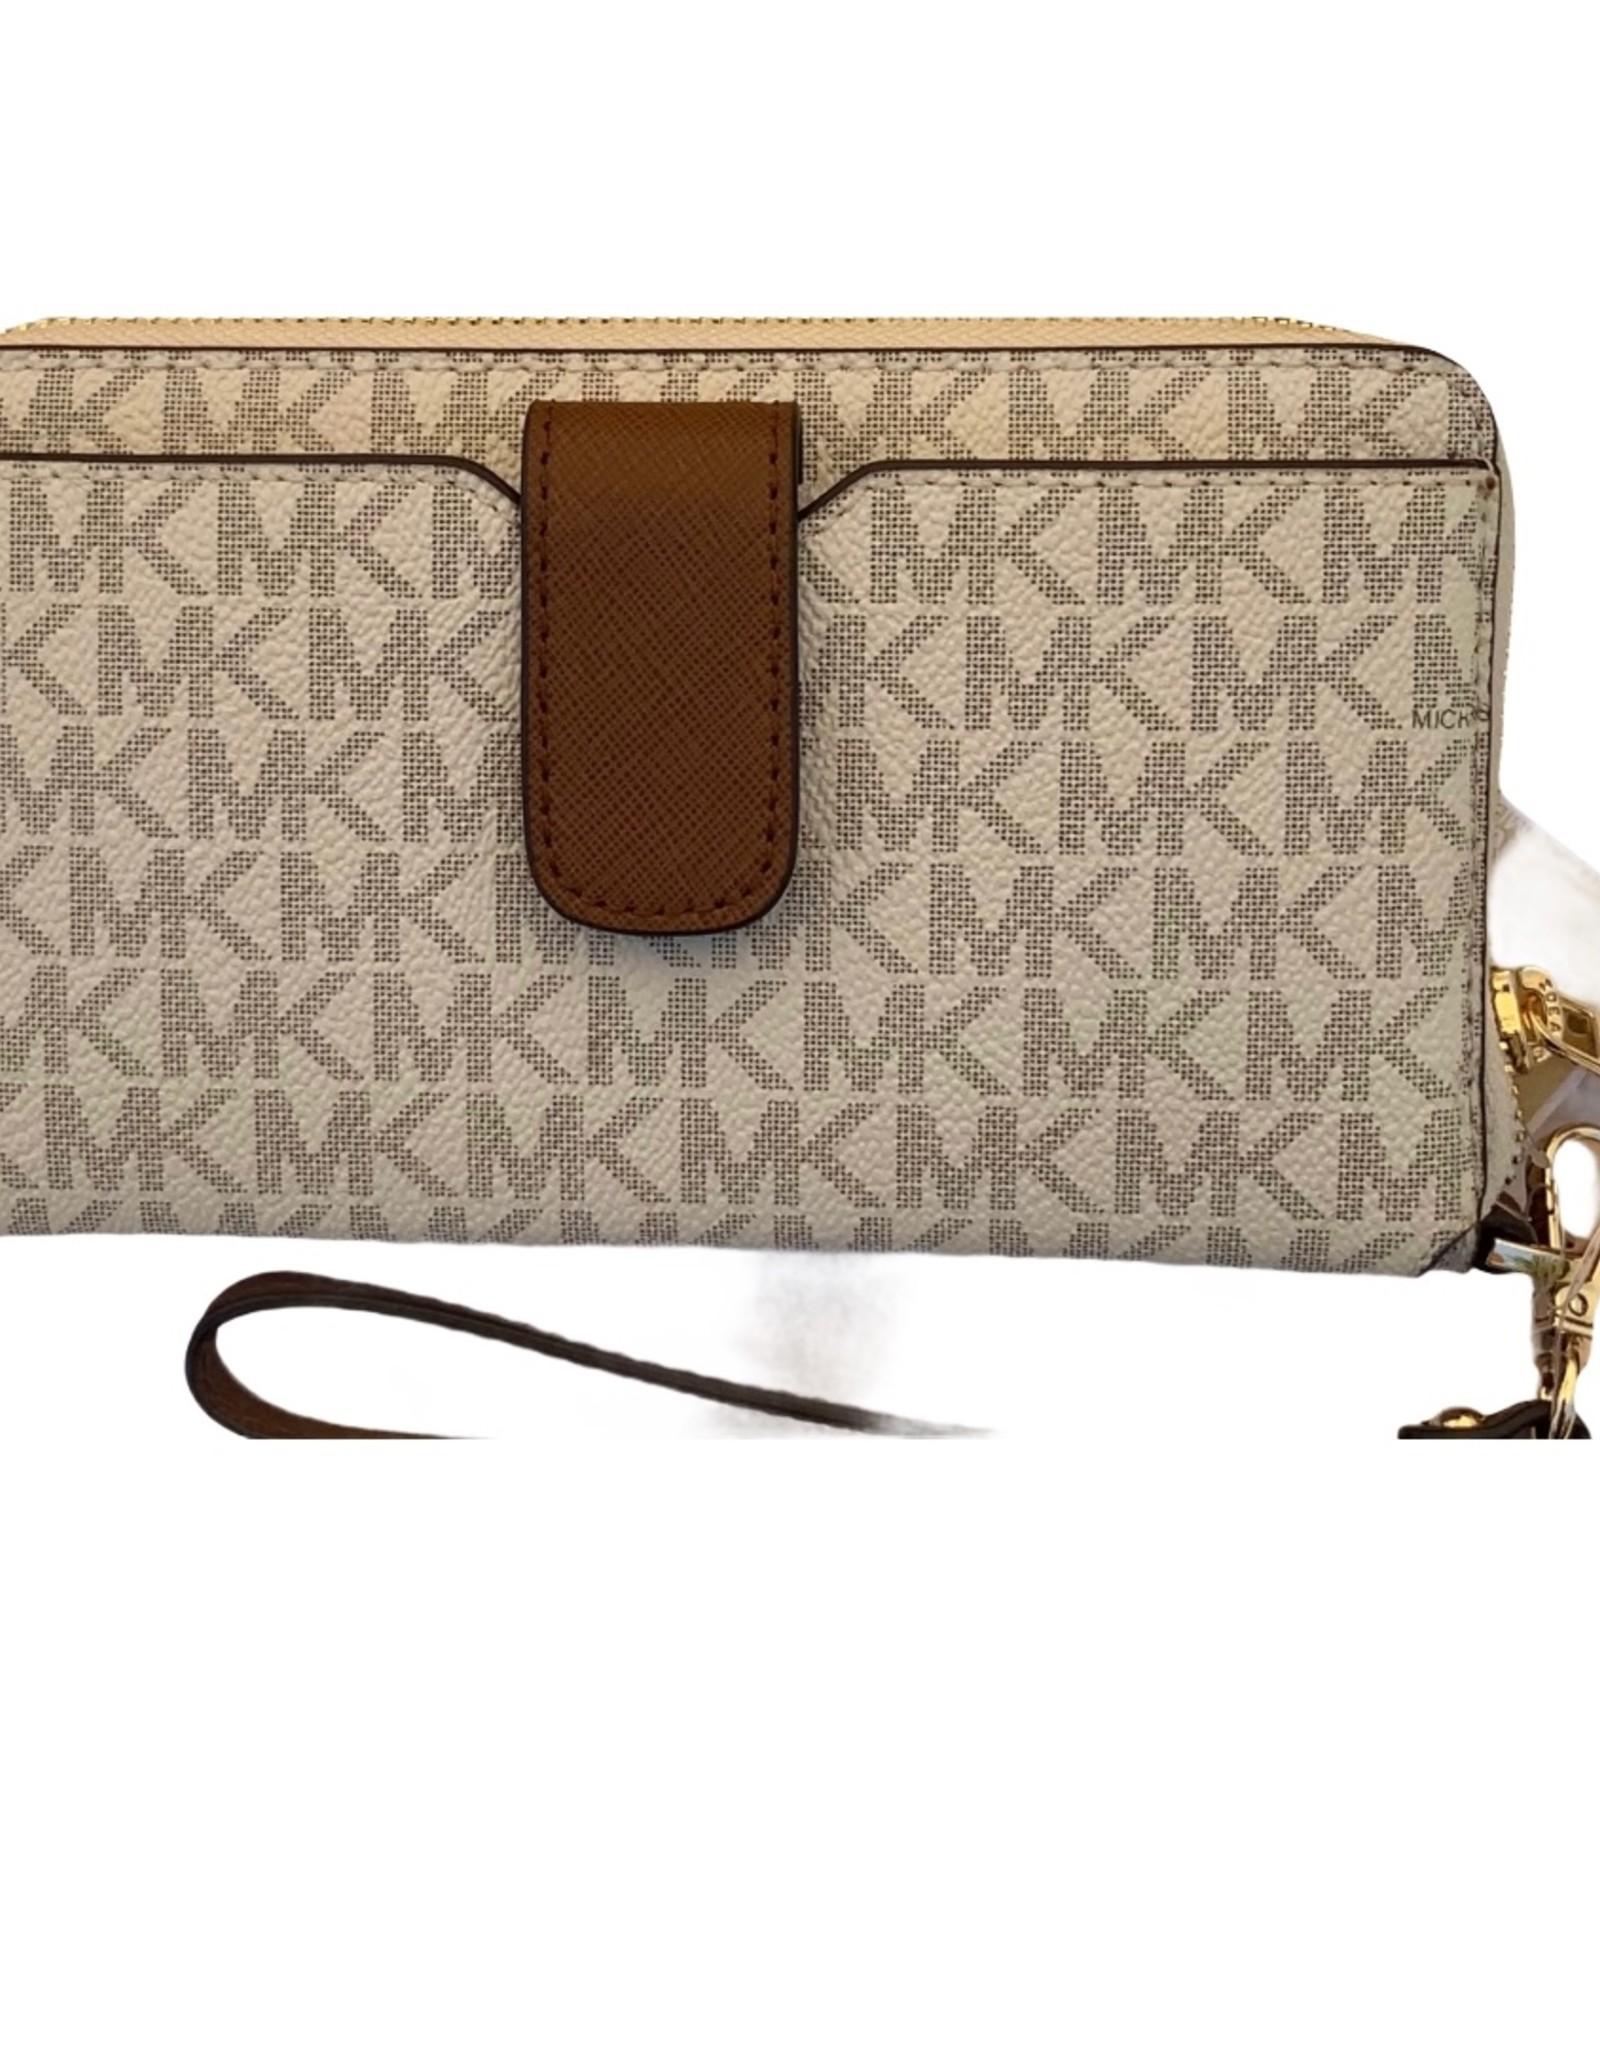 Michael Kors Michael Kors Wallet Phone Holder Zip All Around